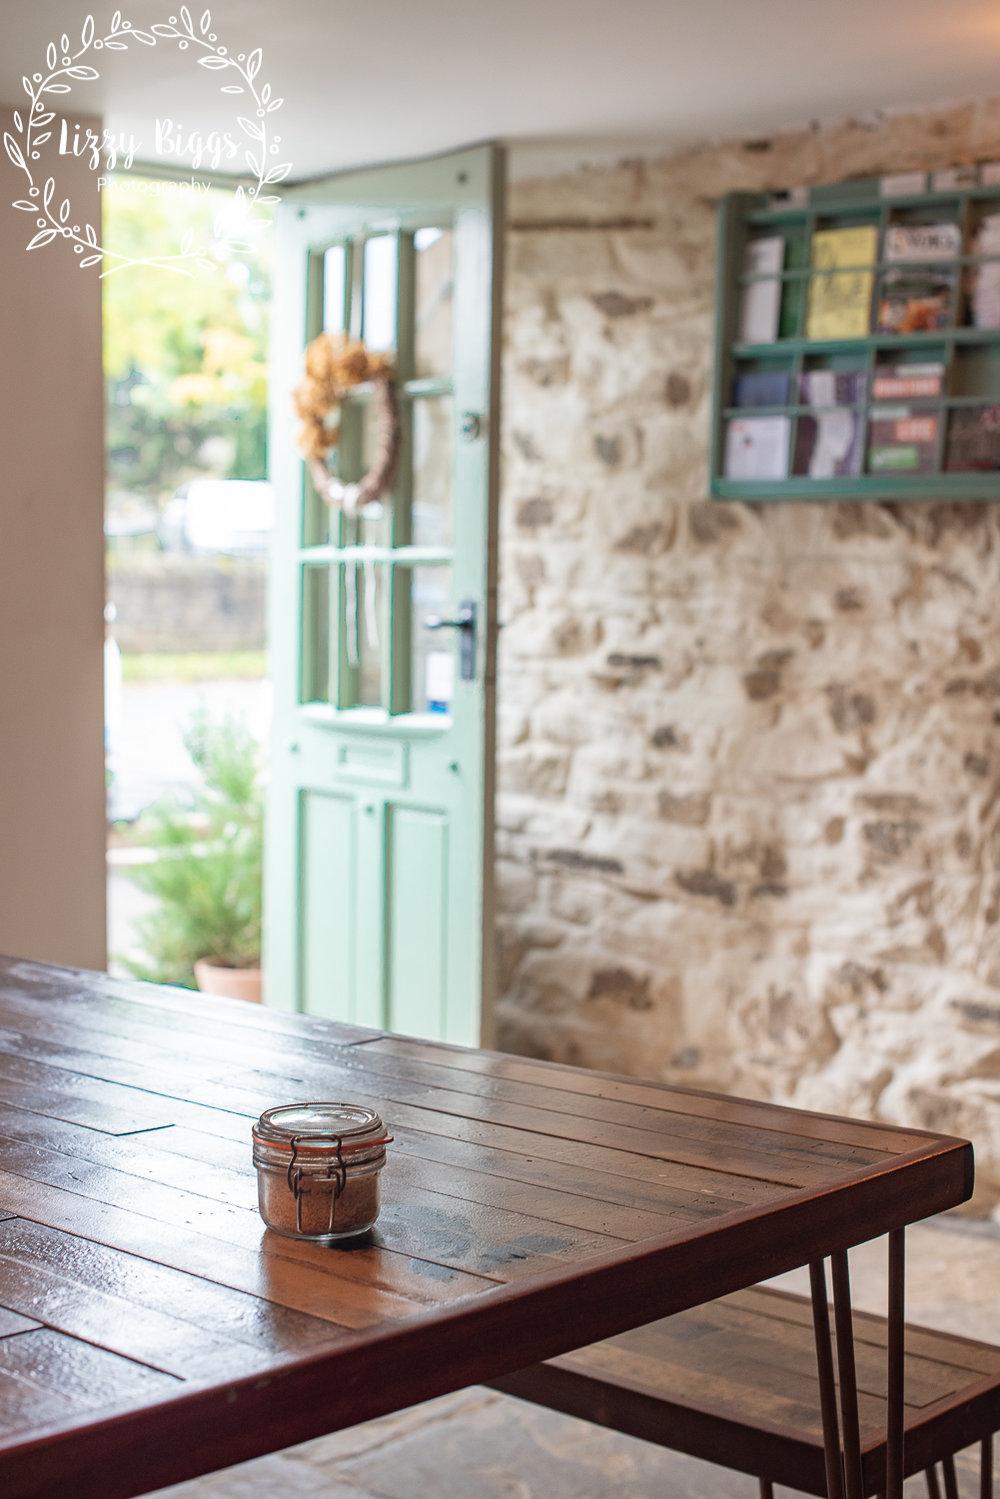 Lizzy_Biggs_Photography_Grass_Hopper_Cafe_open_door